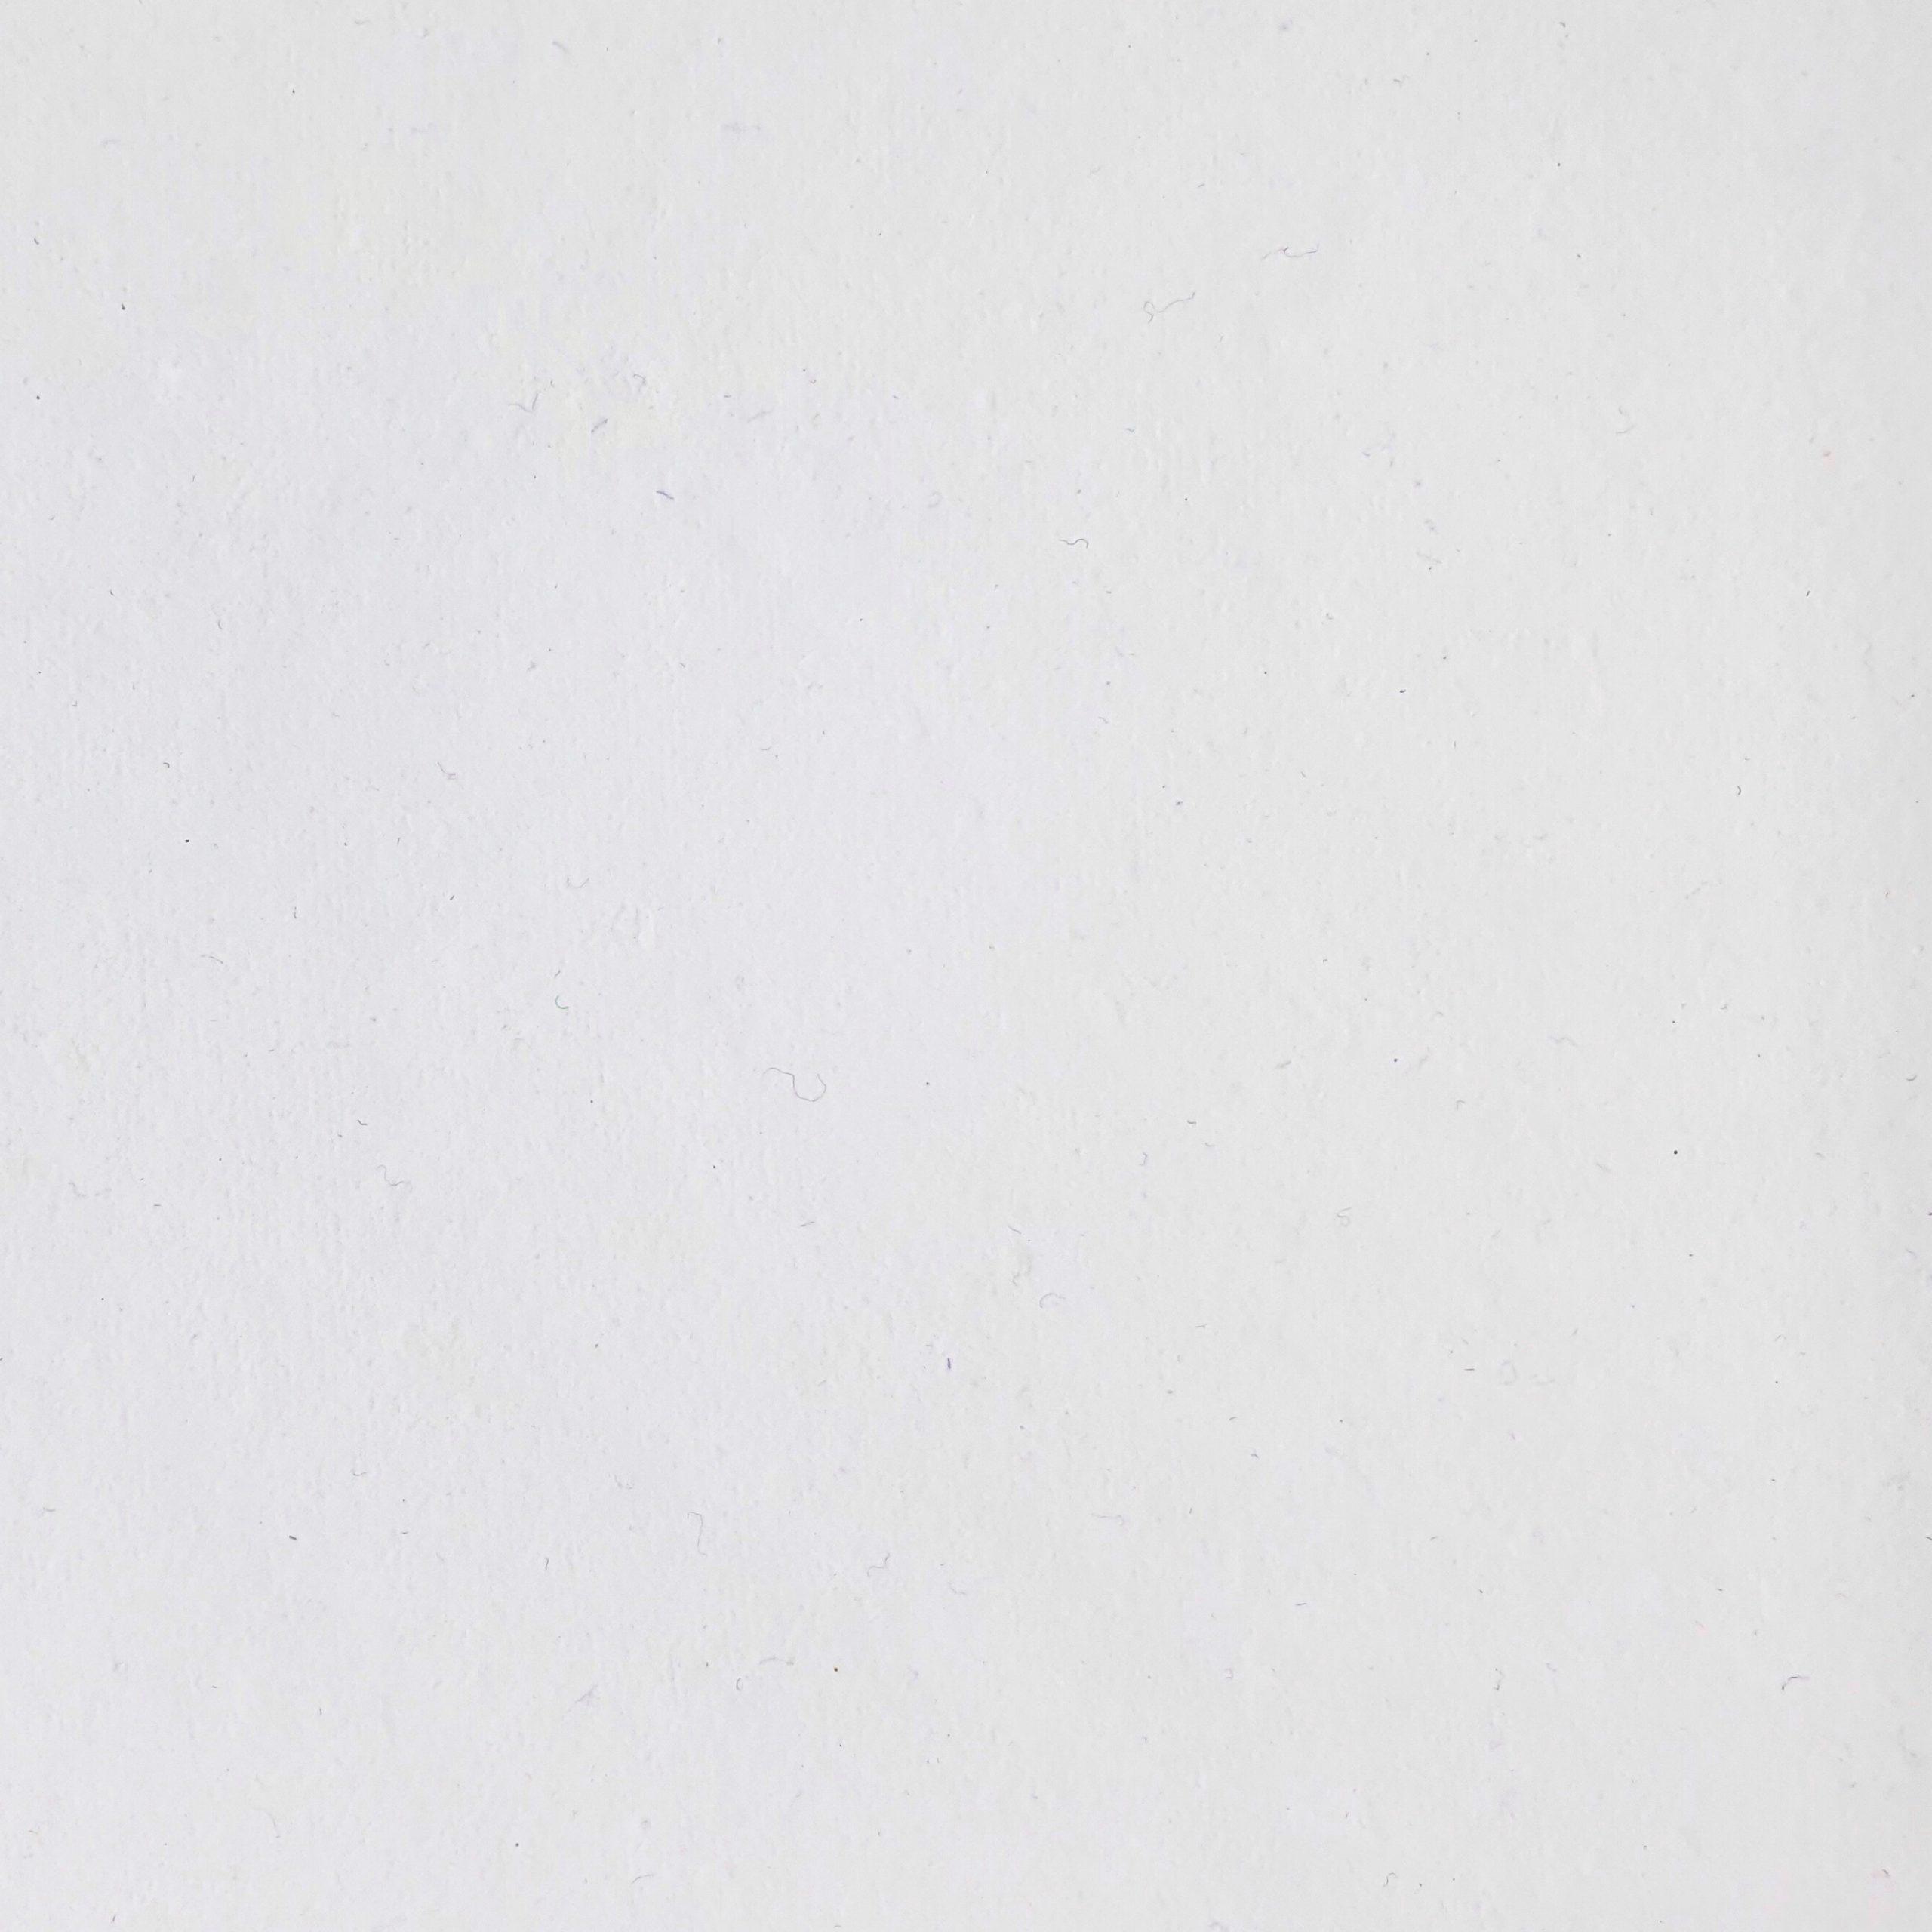 papel ecologico blanco